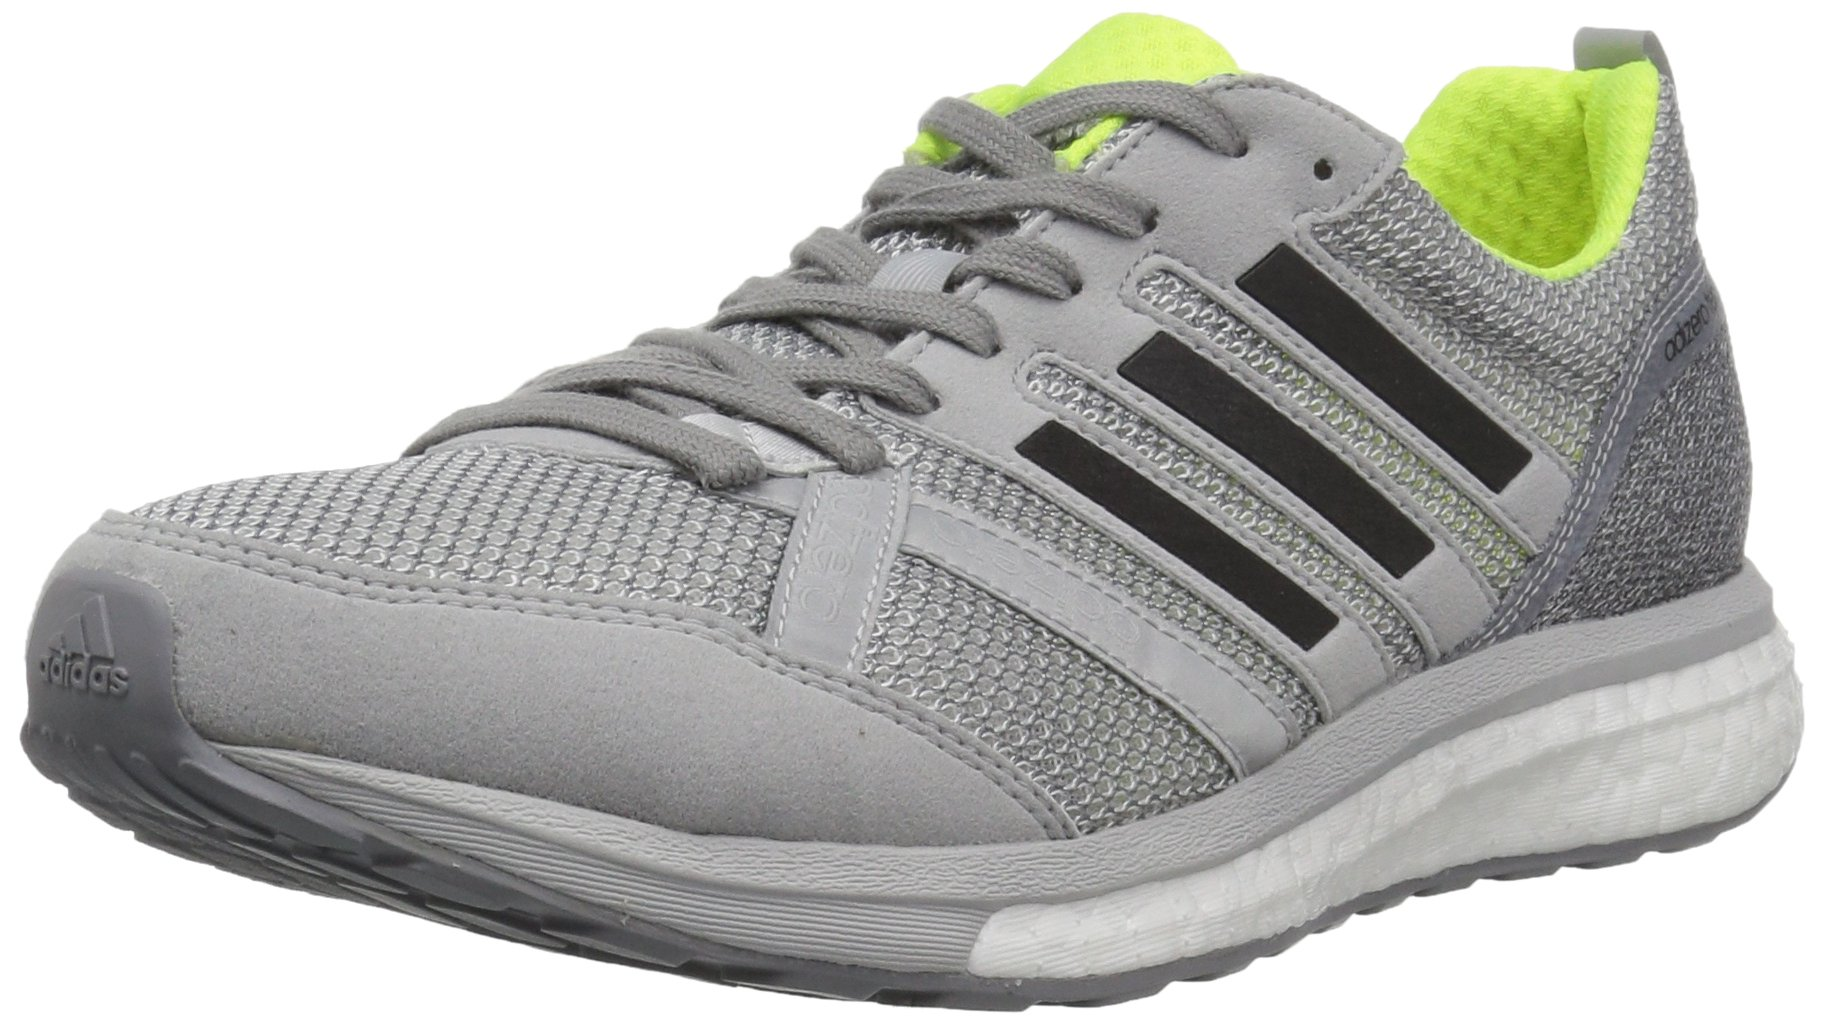 huge discount af16d 9399c Galleon - Adidas Originals Mens Adizero Tempo 9 M Running Shoe, GreyBlackSolar  Yellow, 13 M US